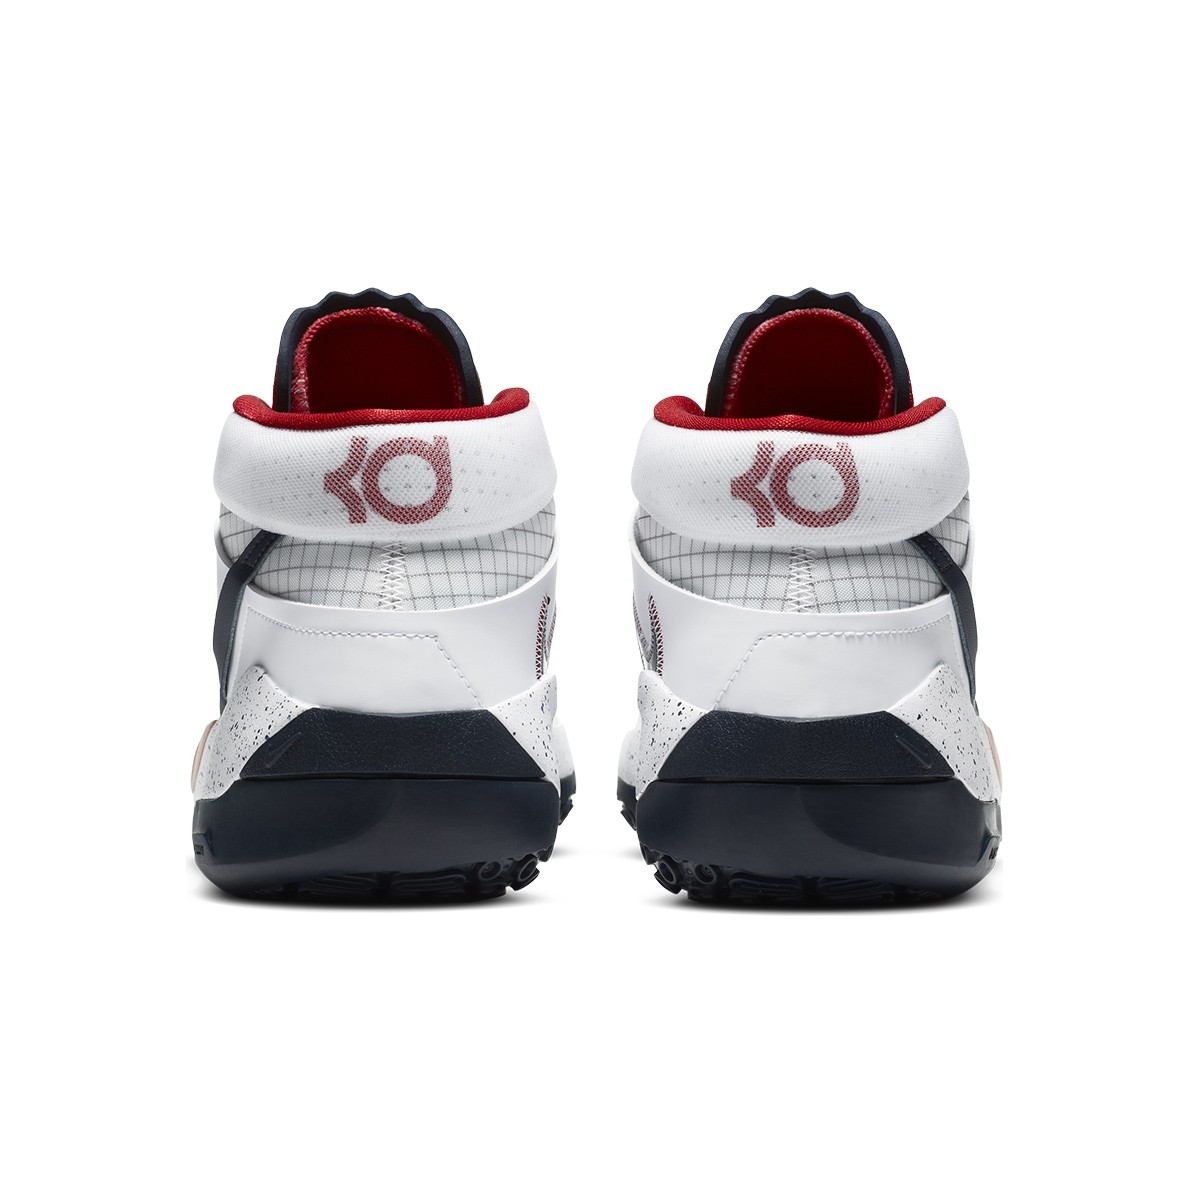 Nike KD13 'USA'-CI9948-101